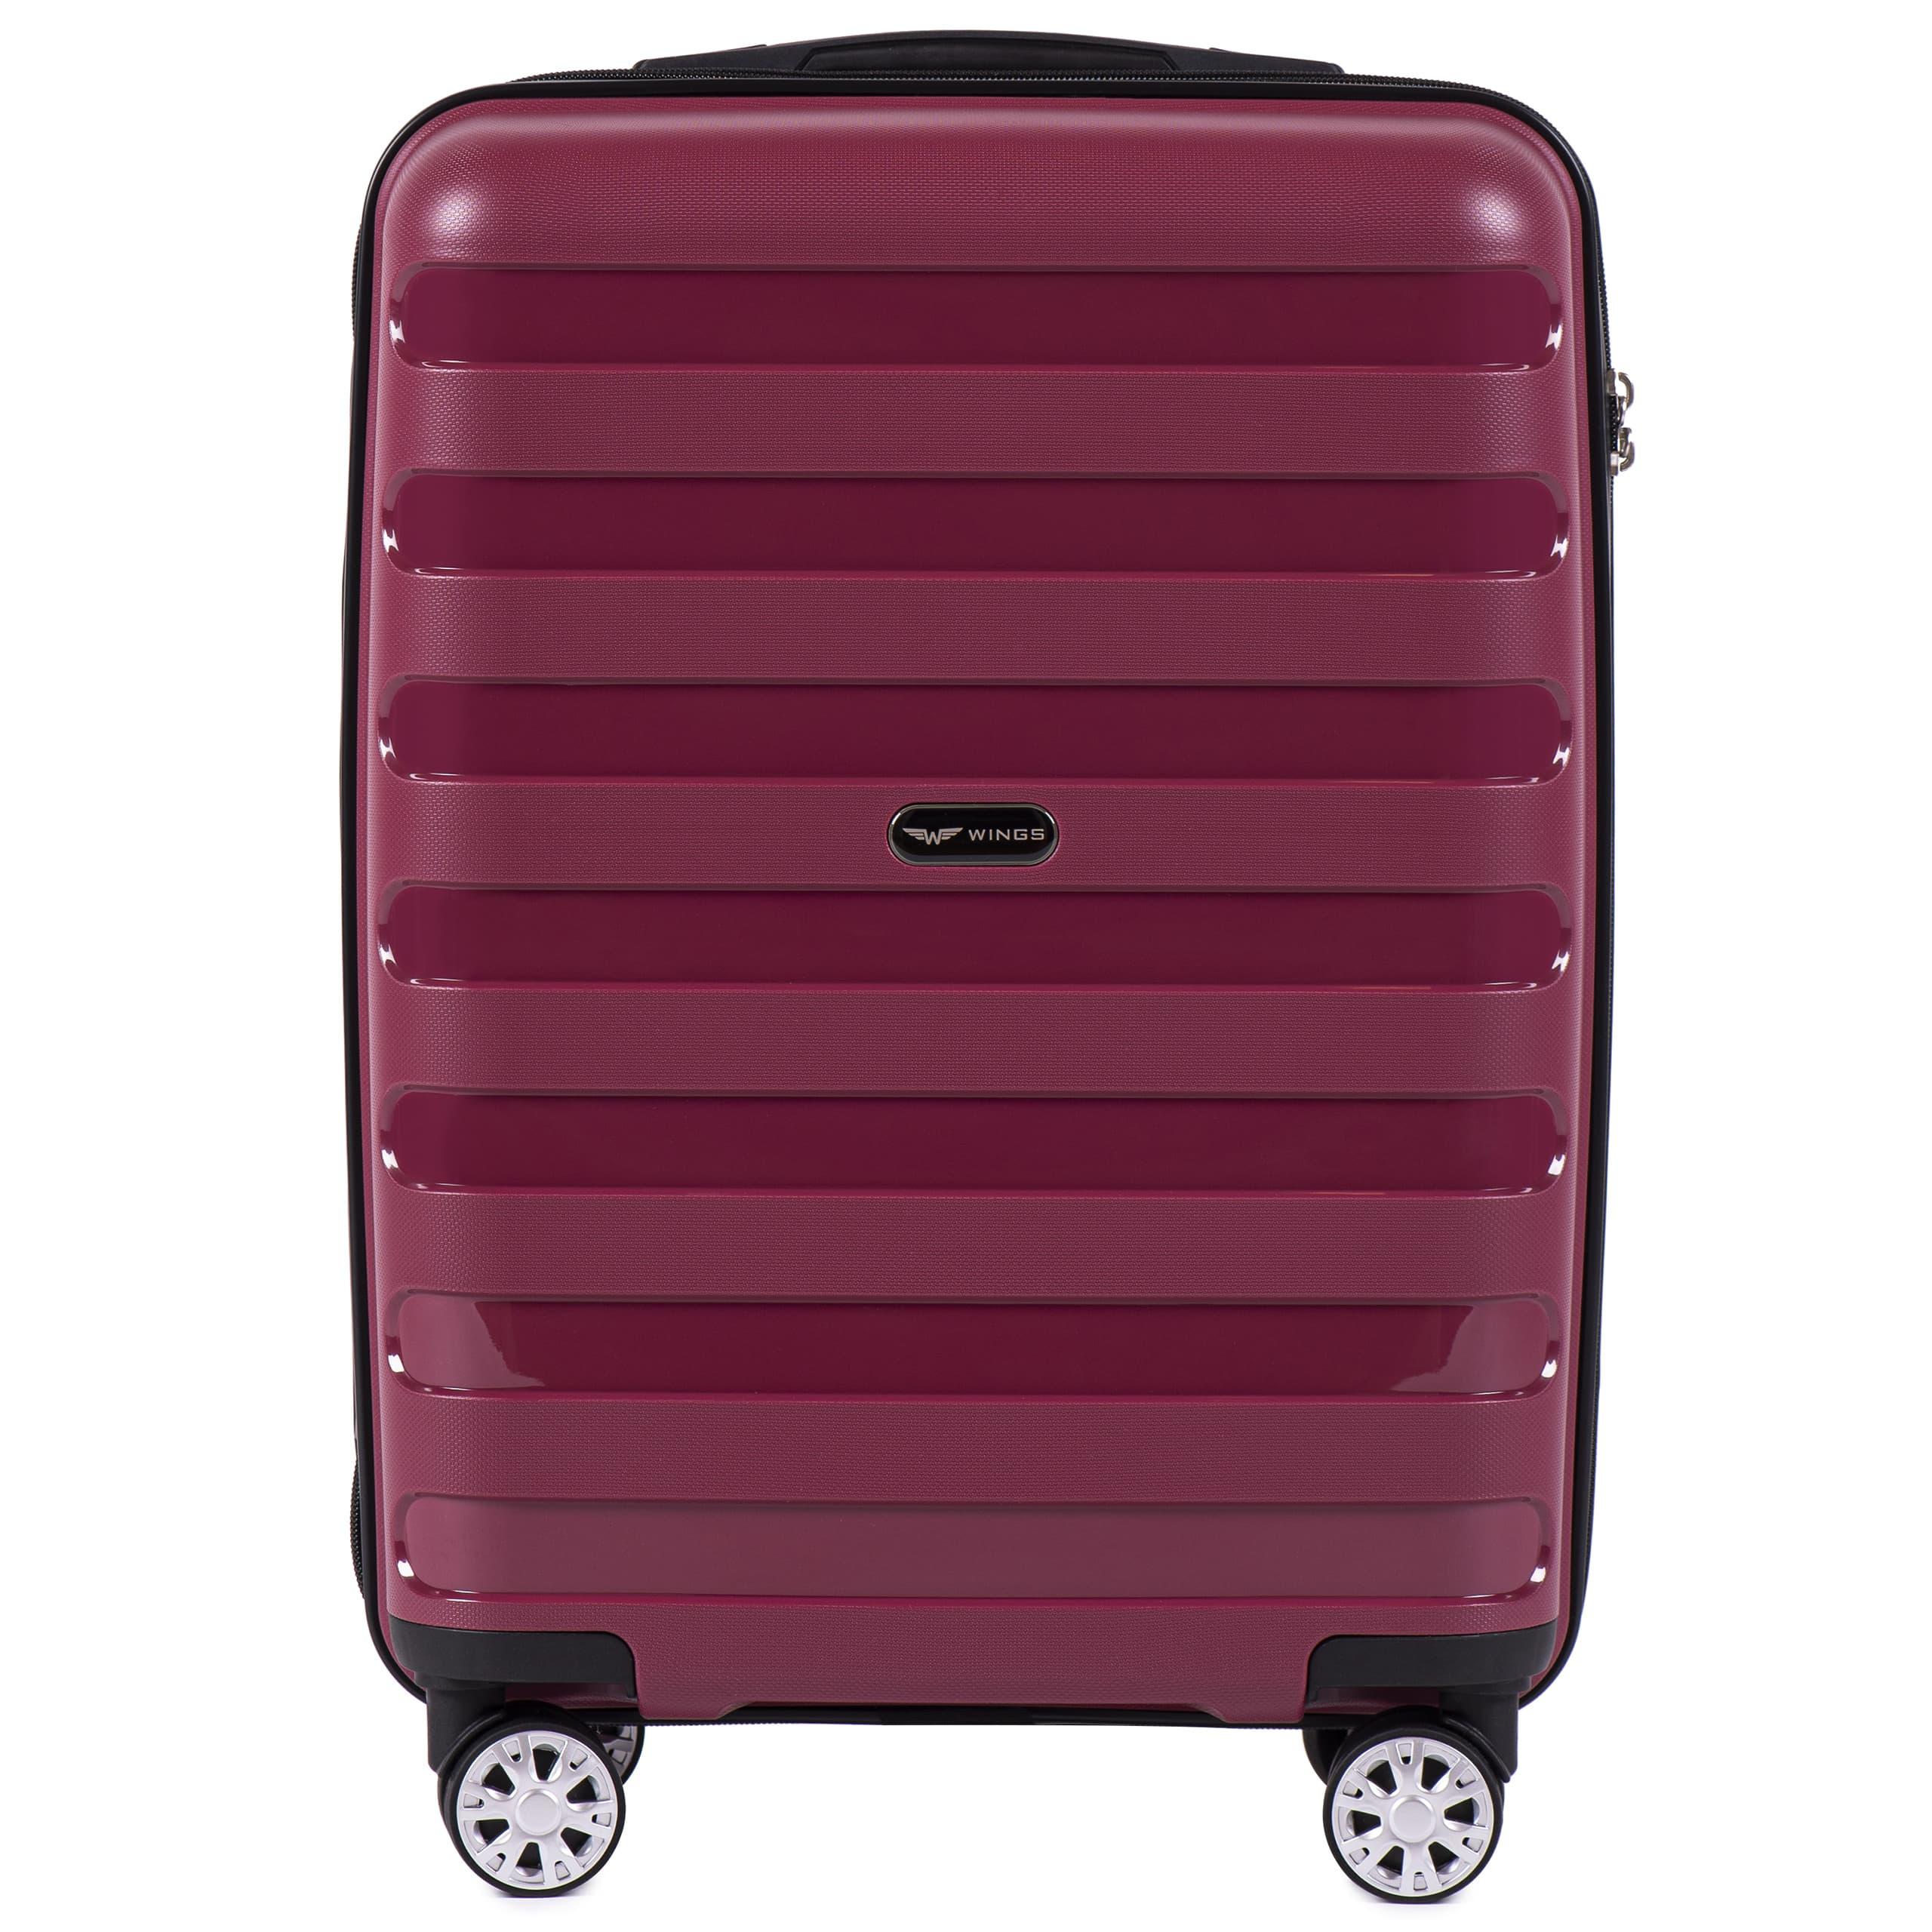 Маленький чемодан для ручной клади WINGS Prime S PP-07 Red! ДЛЯ 7-10 кг!